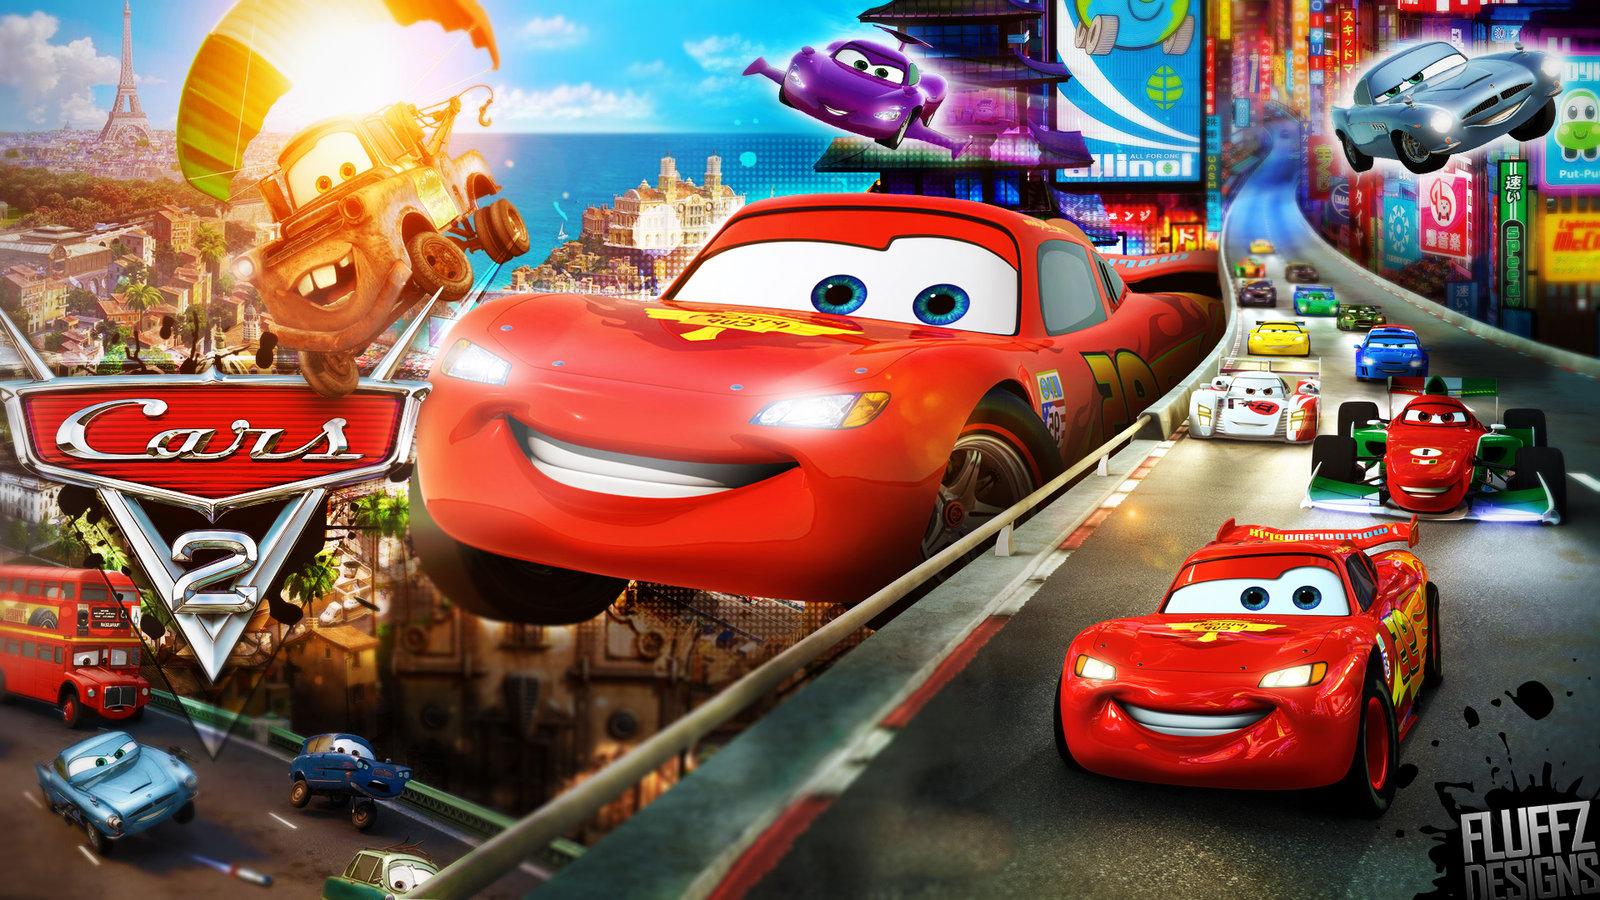 Wonderful Disney S Cars 2  Wallpaper By Fluffydesignshd D67prz2 Good Looking